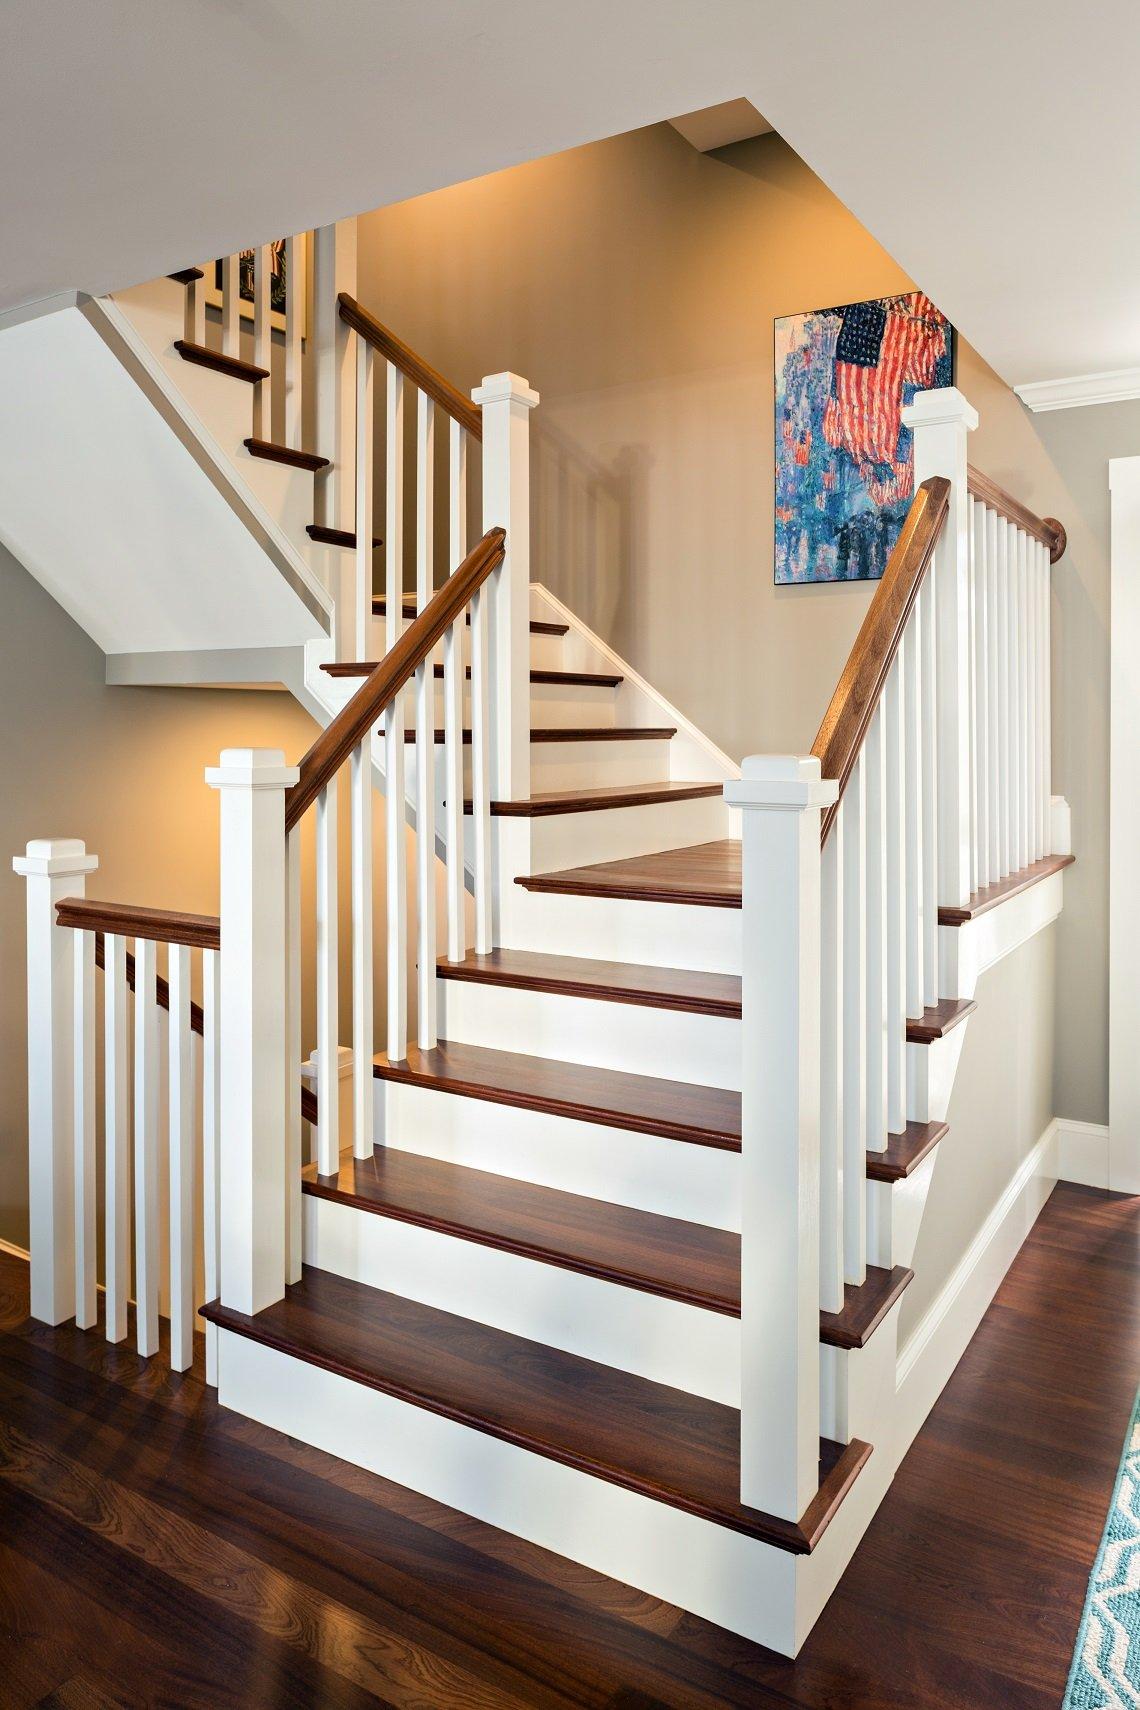 Northside_Bayview_Cape_stairs_w_landing_web.jpg